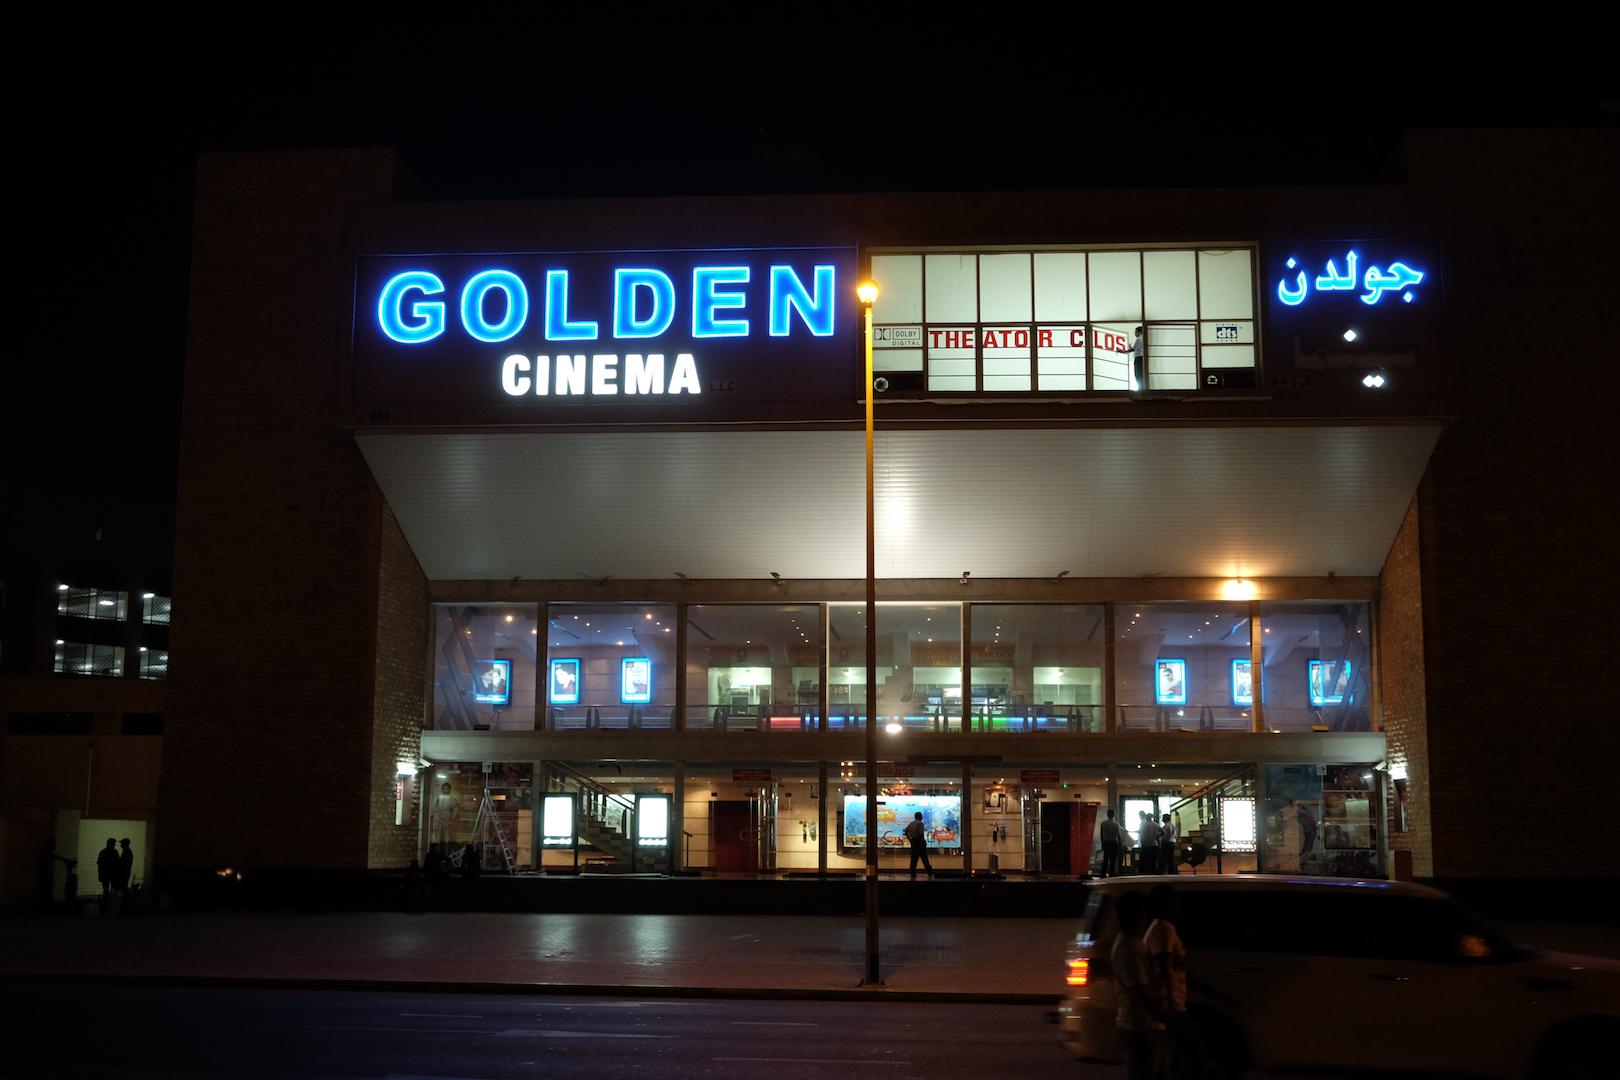 kerning-cultures-golden-cinema-1.jpg